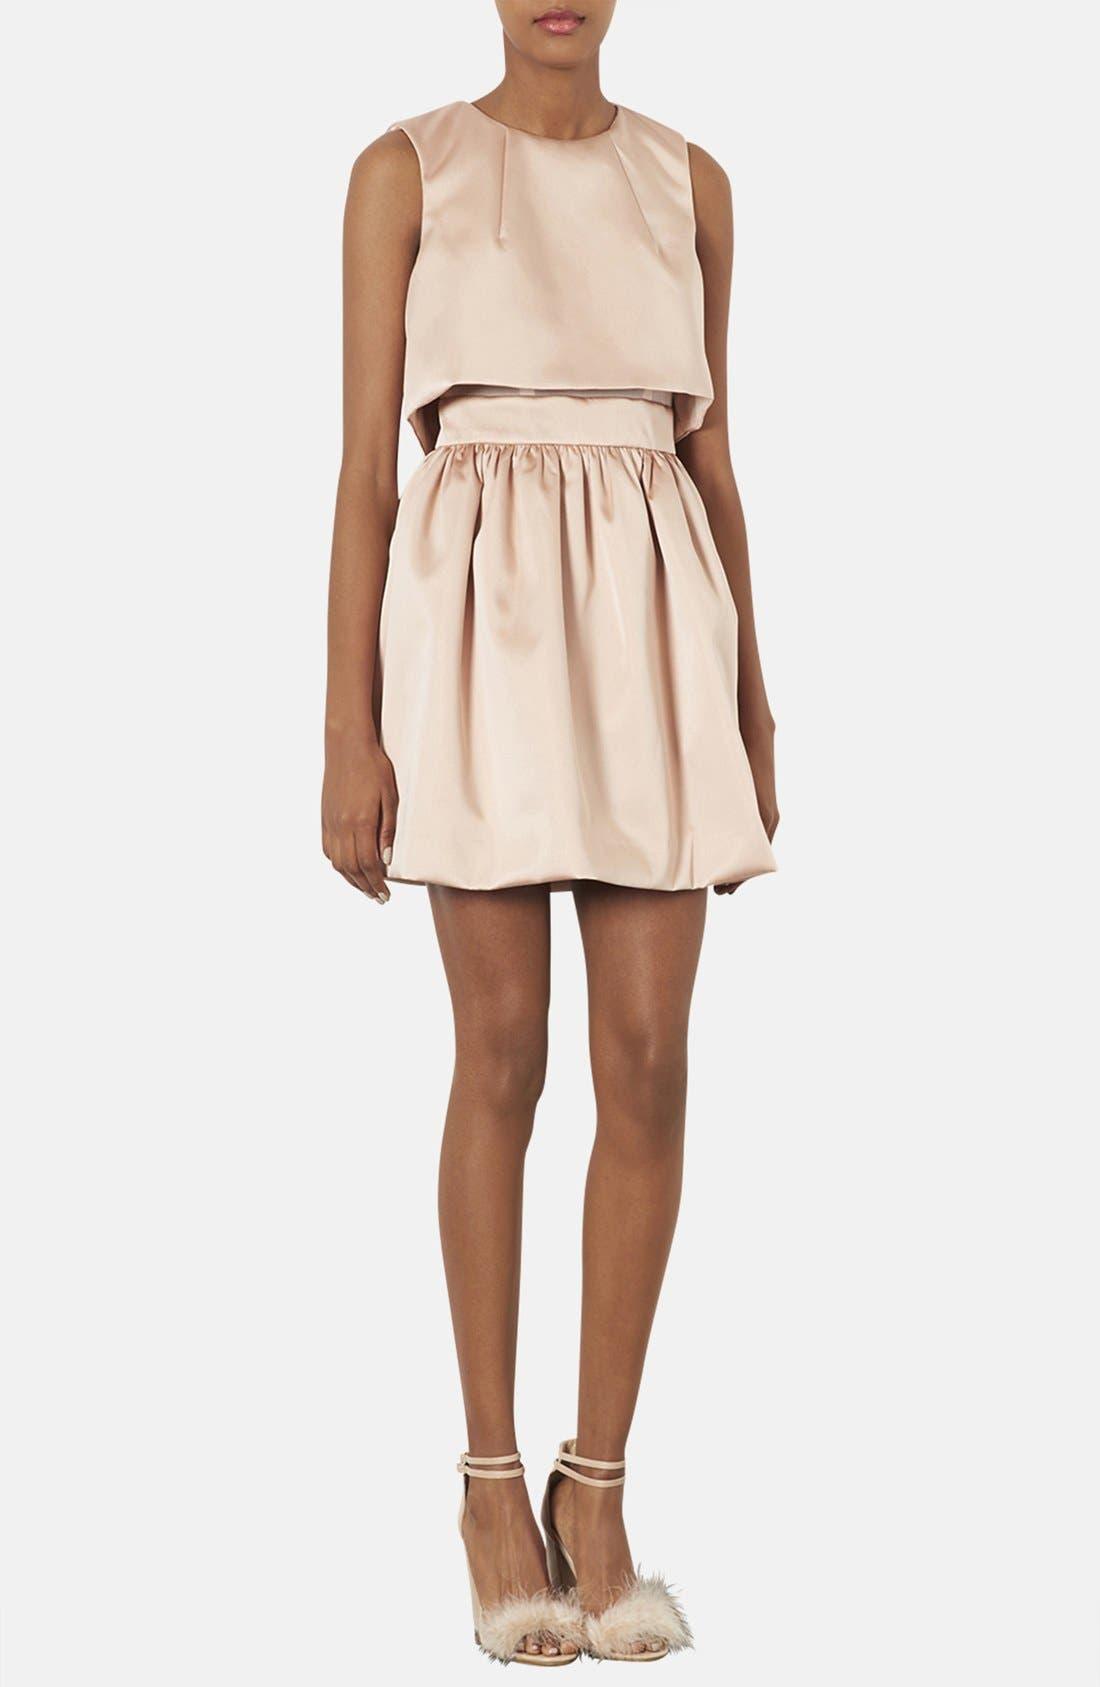 TOPSHOP 'Duchess' Crop Overlay Satin Skater Dress, Main, color, 250